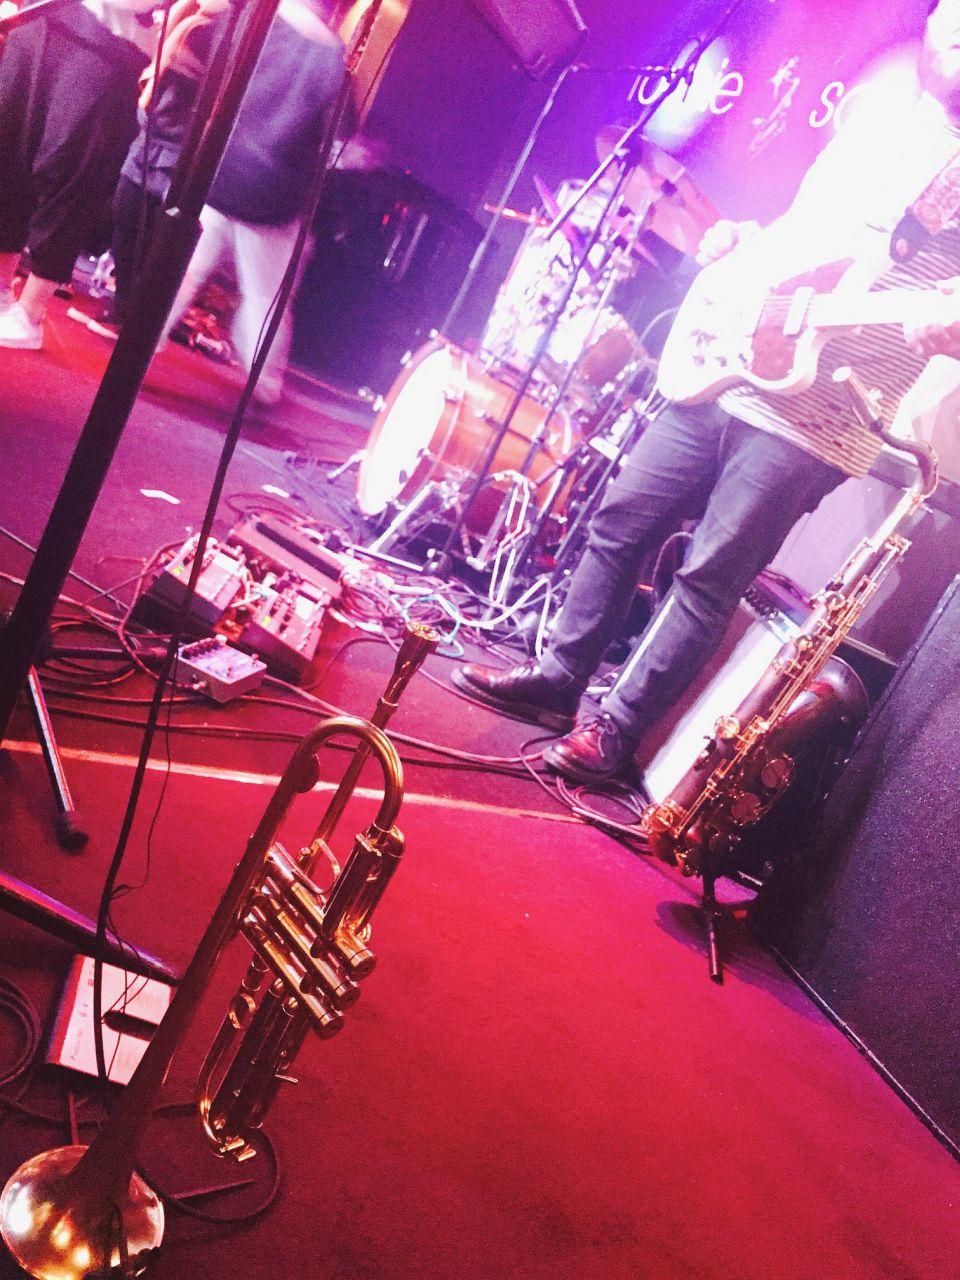 inderbinen-musicians-03